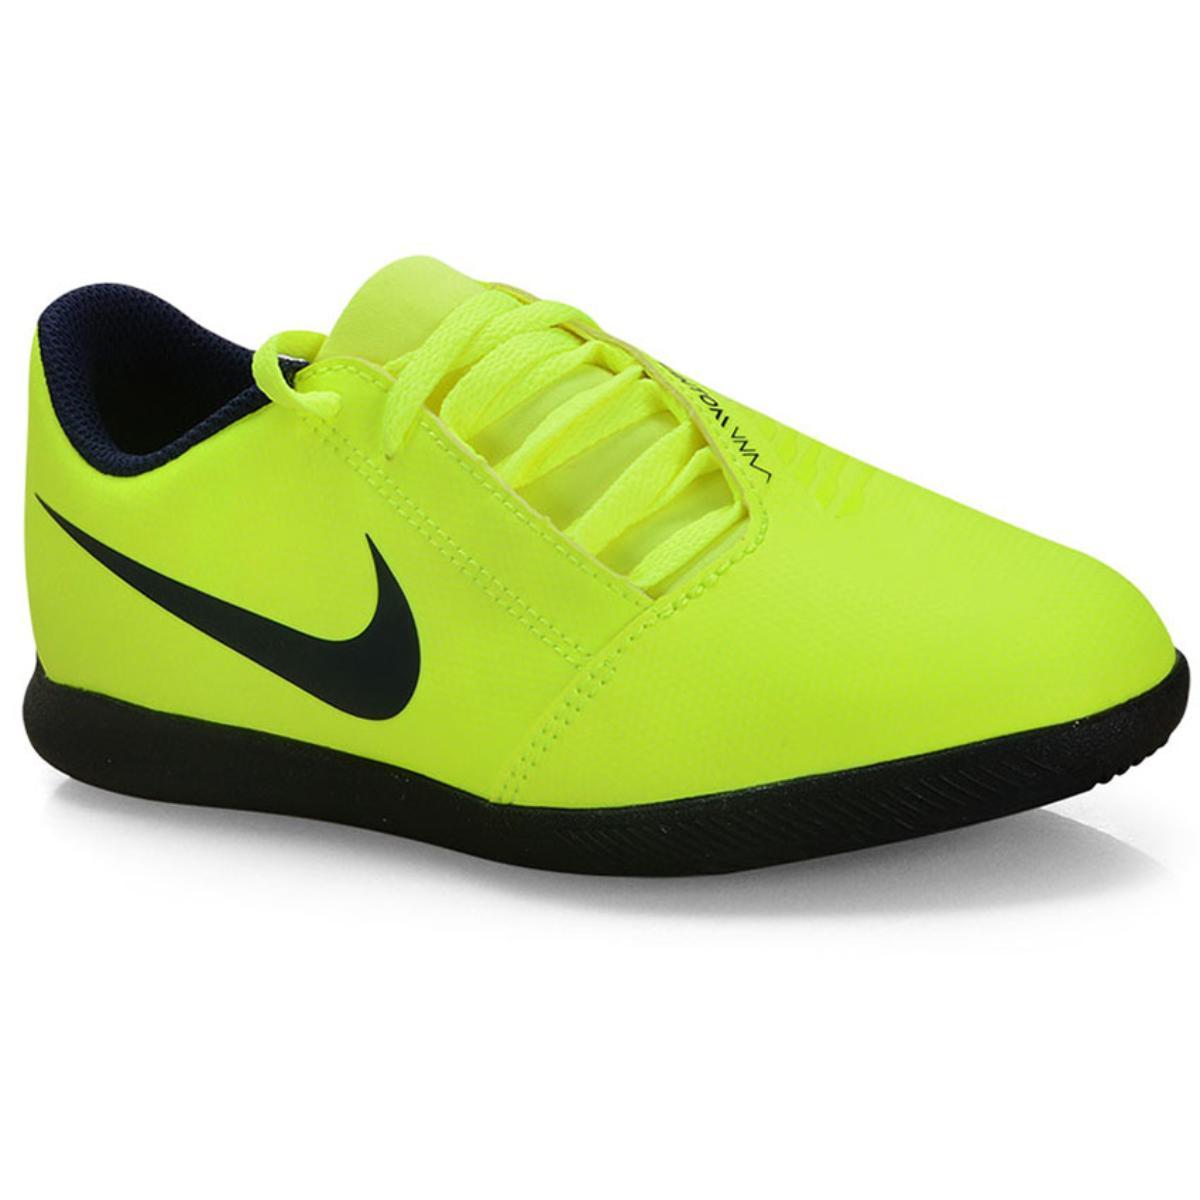 Tênis Masc Infantil Nike Ao0399-717 jr Phanton Venom Club ic Limão/preto